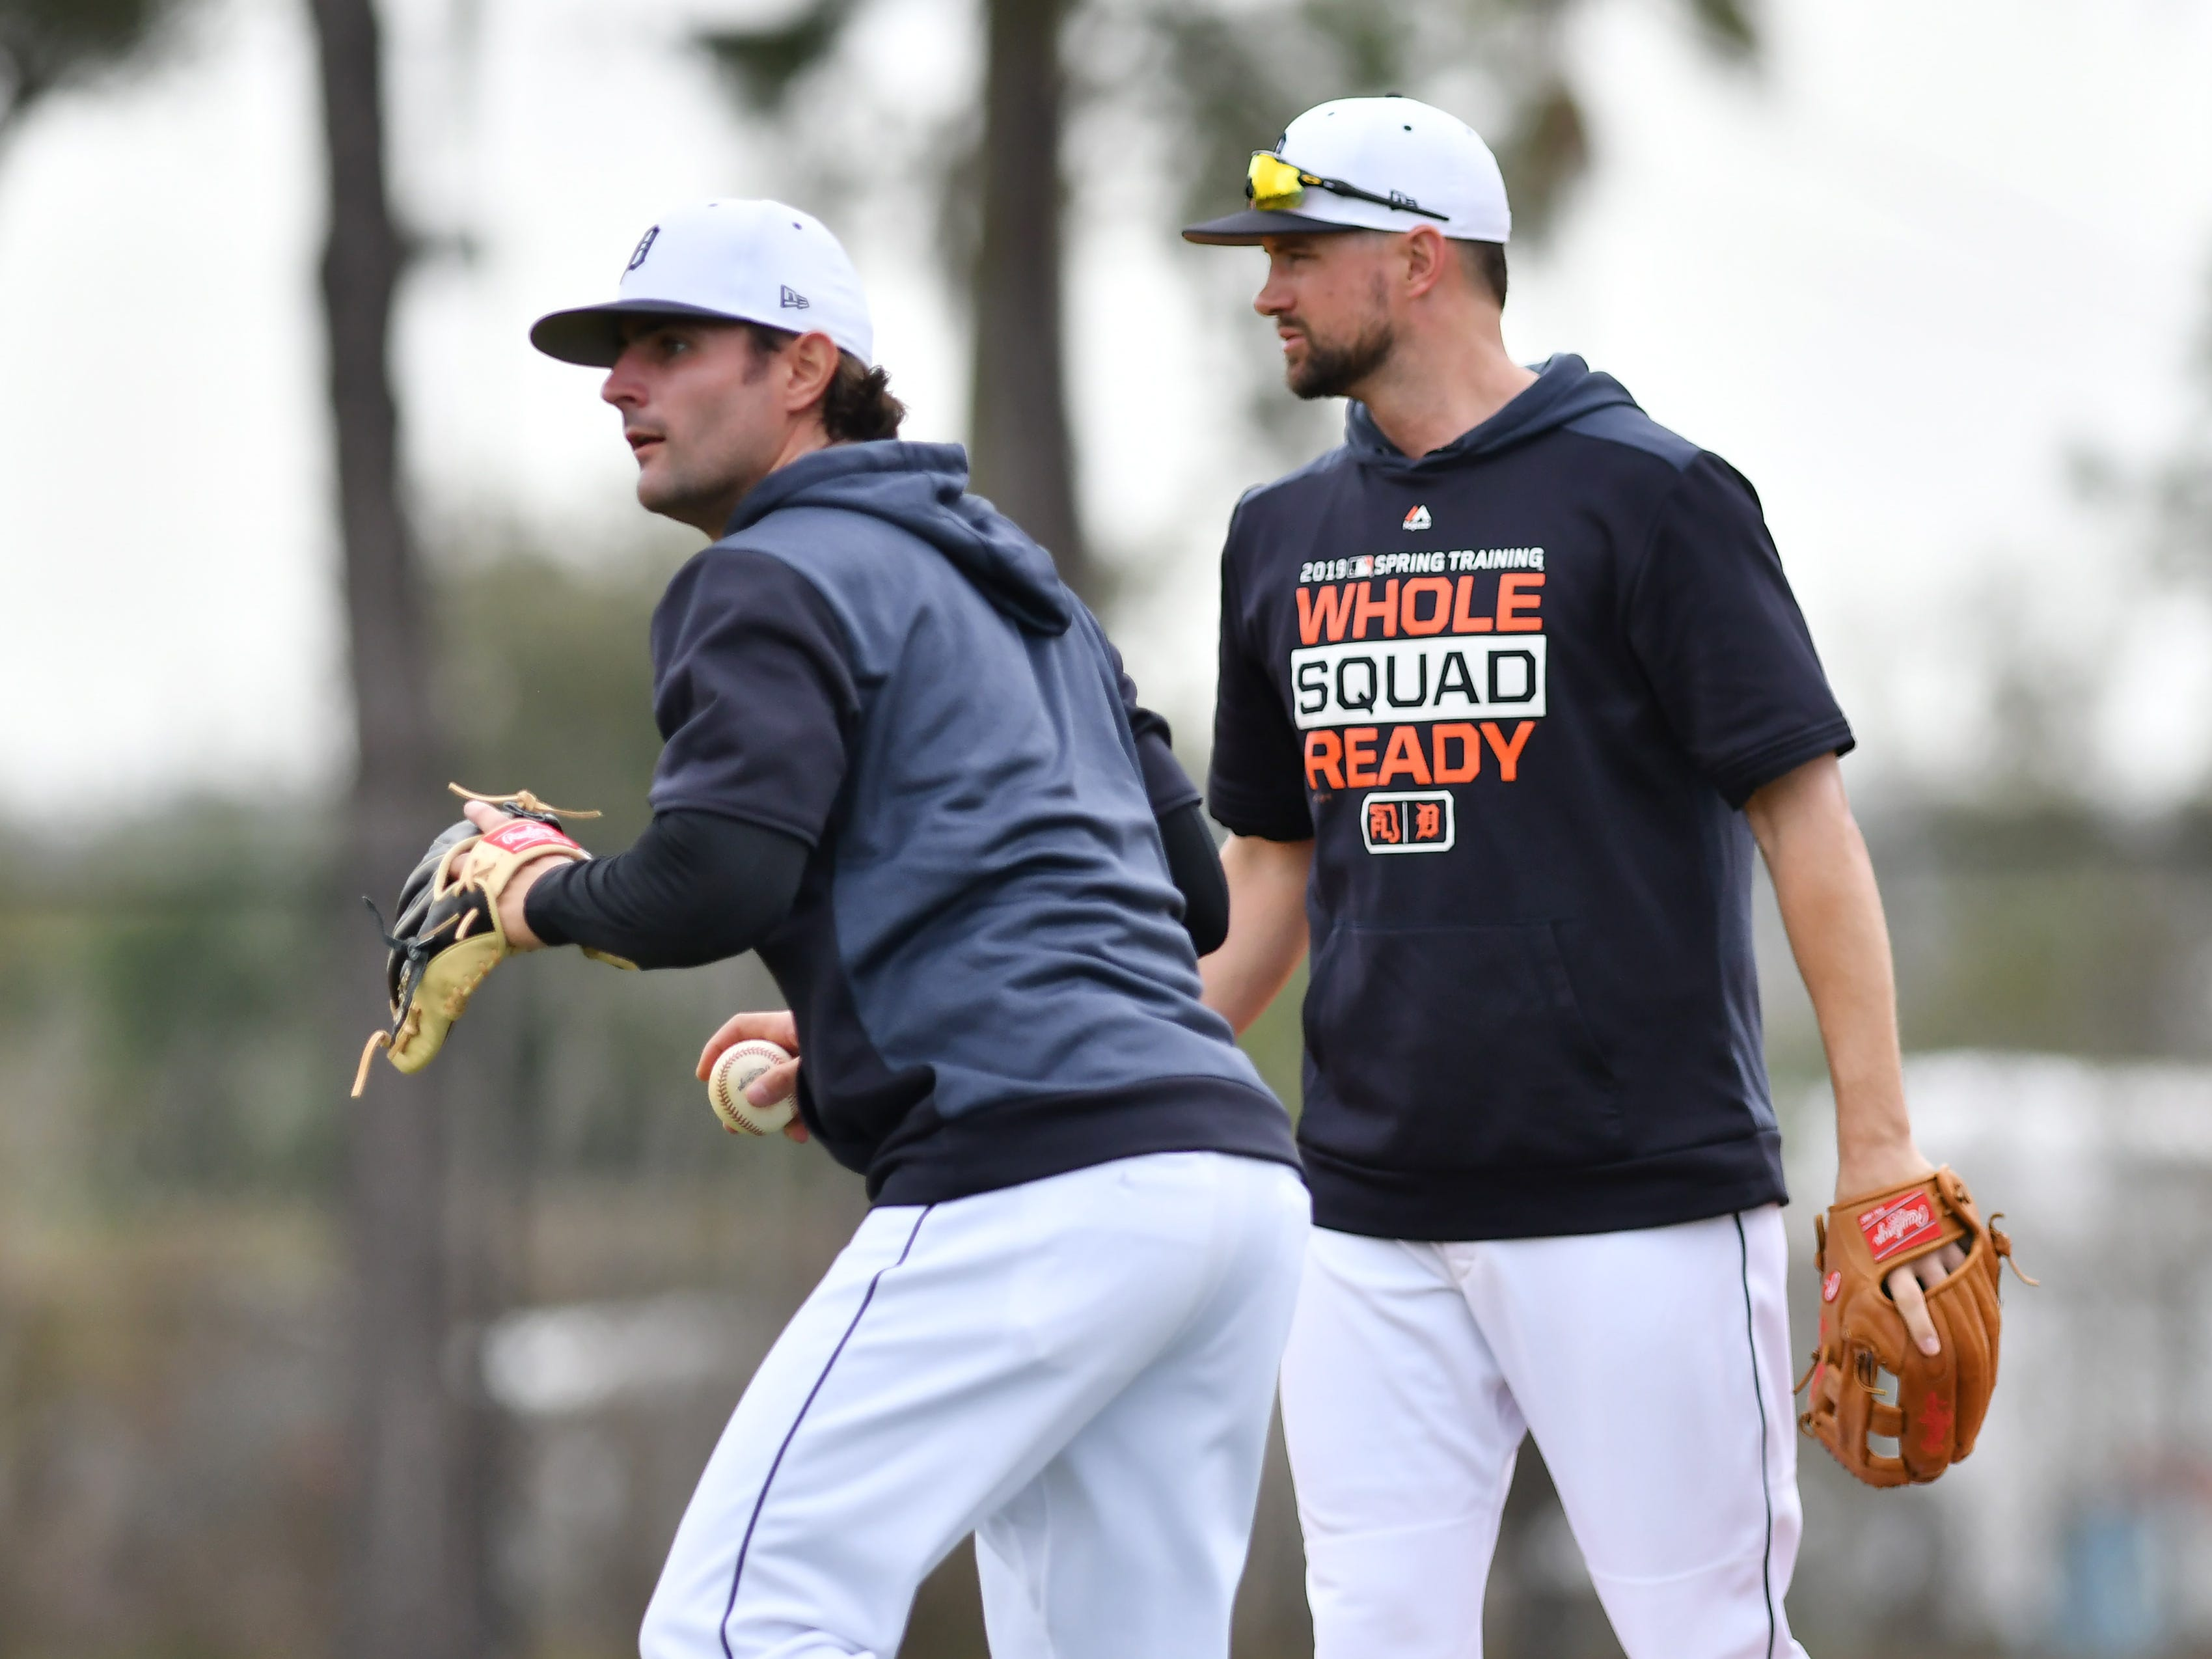 Non-roster invitee Pete Kozma fields a grounder in front of shortstop Jordy Mercer.